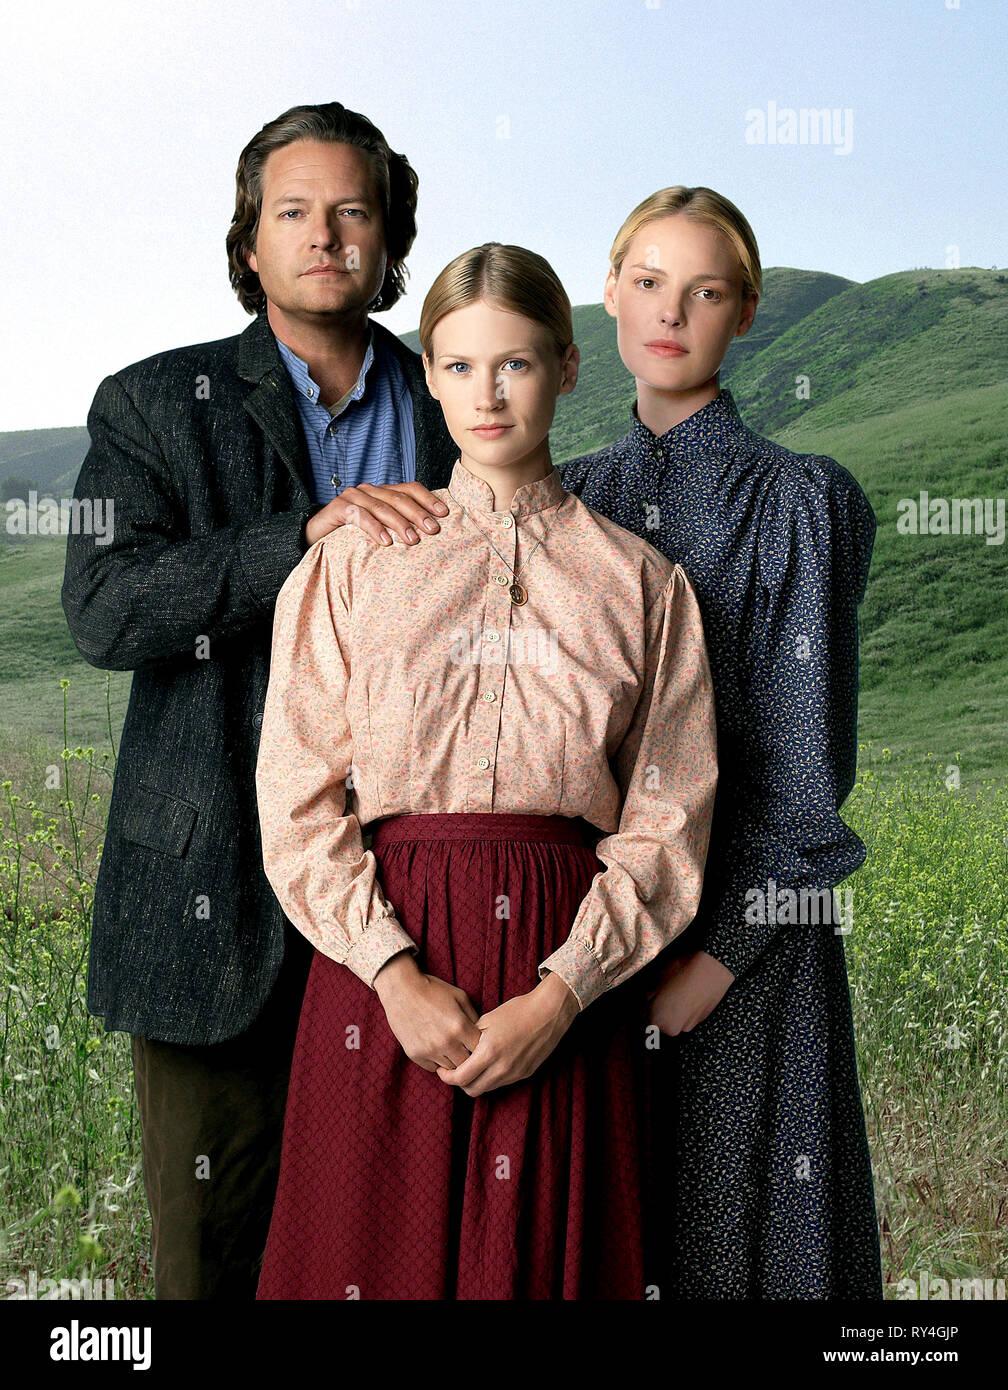 MIDKIFF,JONES,HEIGL, LOVE'S ENDURING PROMISE, 2004 - Stock Image